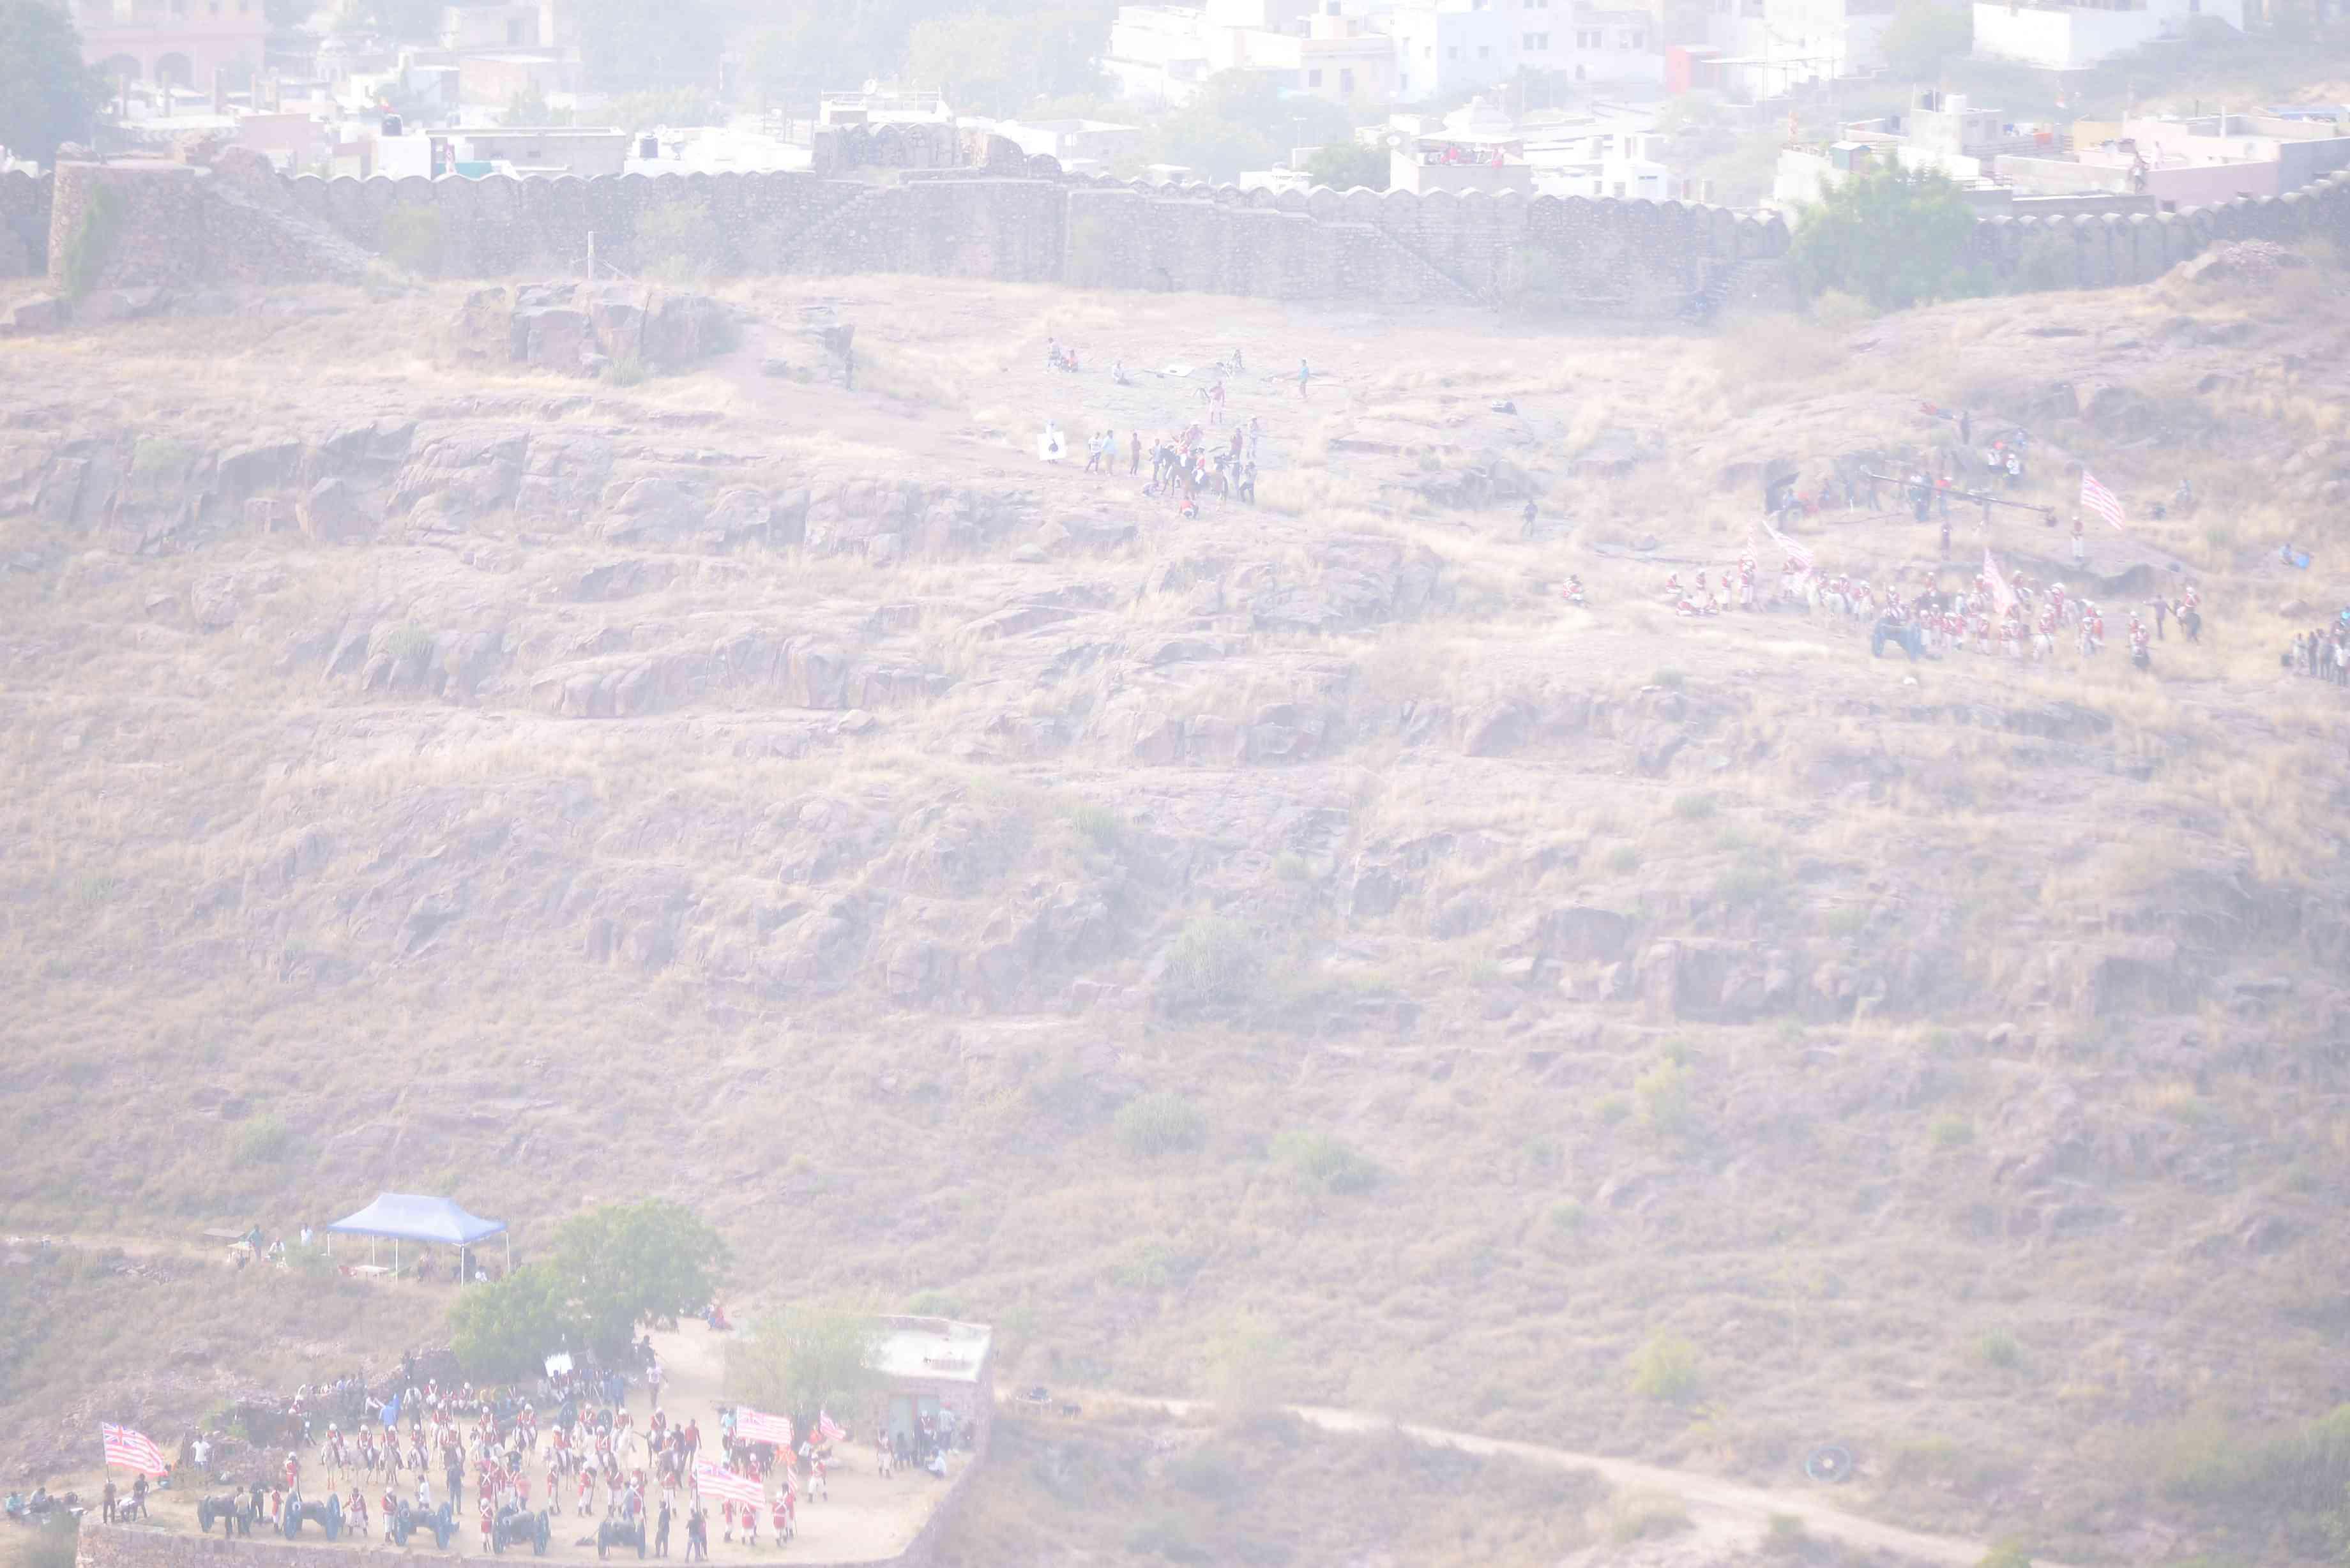 manikarnika the queen of jhansi shooting in Jodhpur